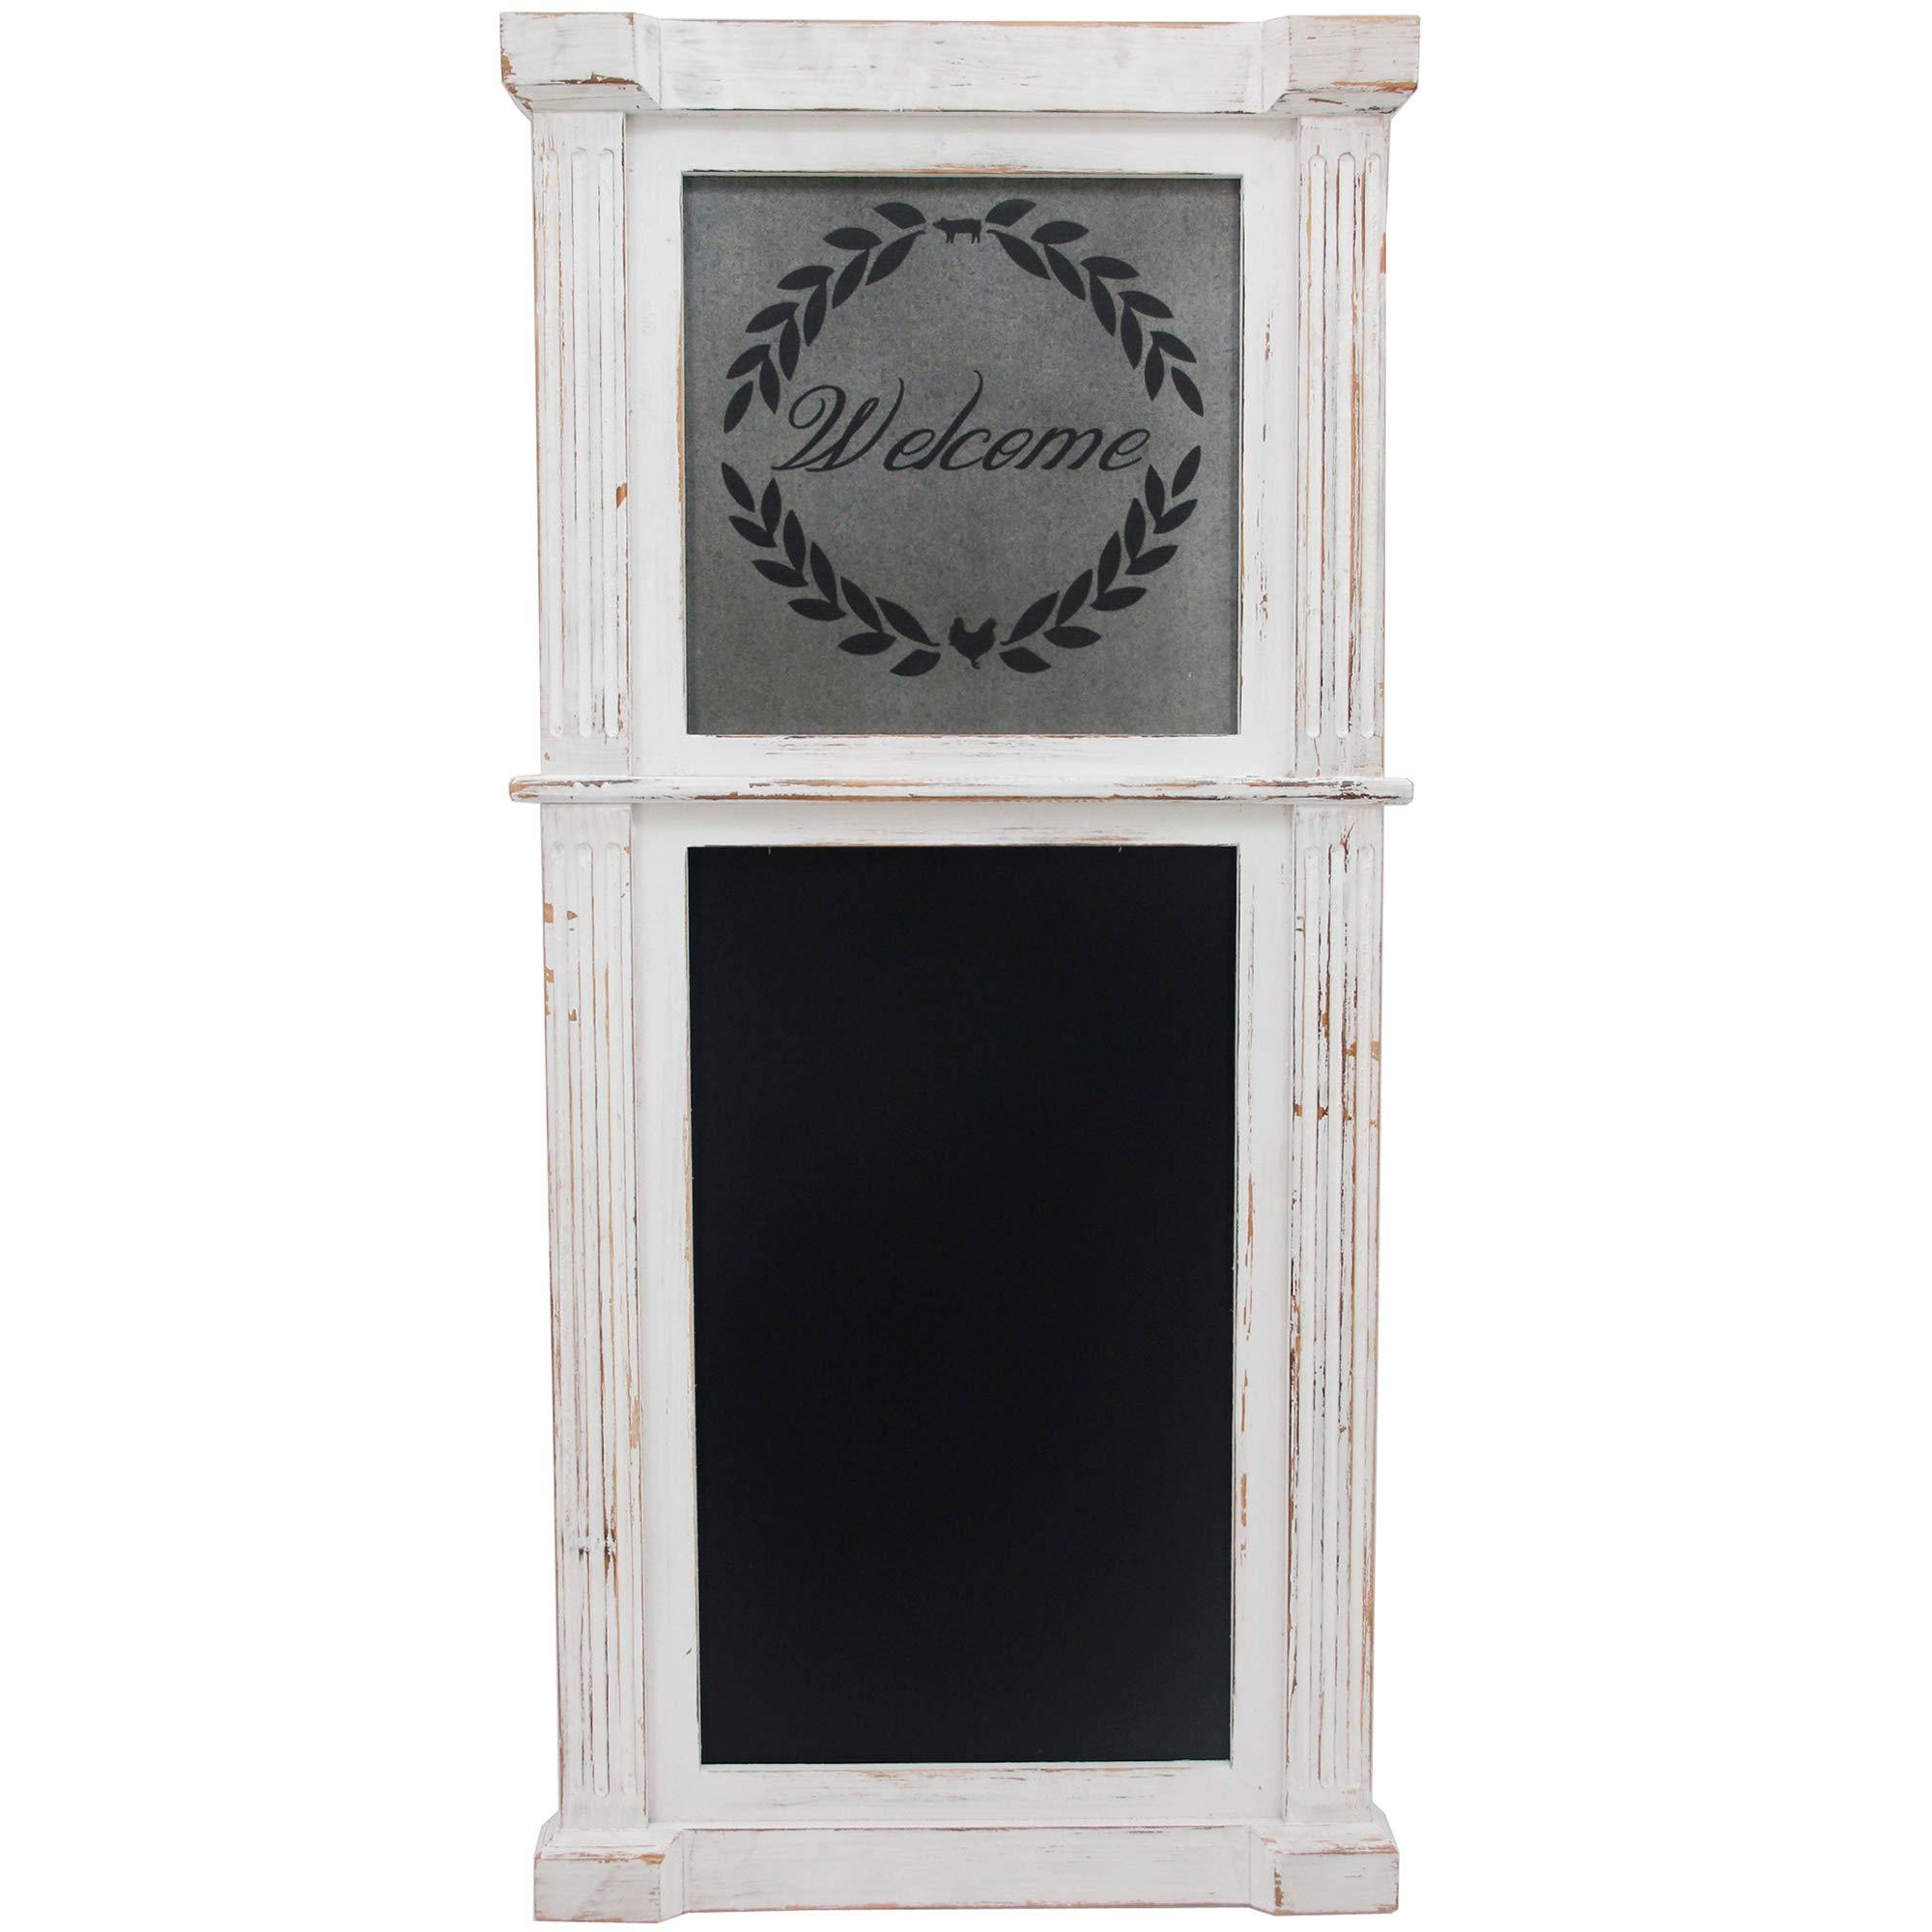 "FirsTime & Co. Whitewash Wreath Chalkboard (34.5 H x 16"" W) $26 at Amazon/Home Depot"